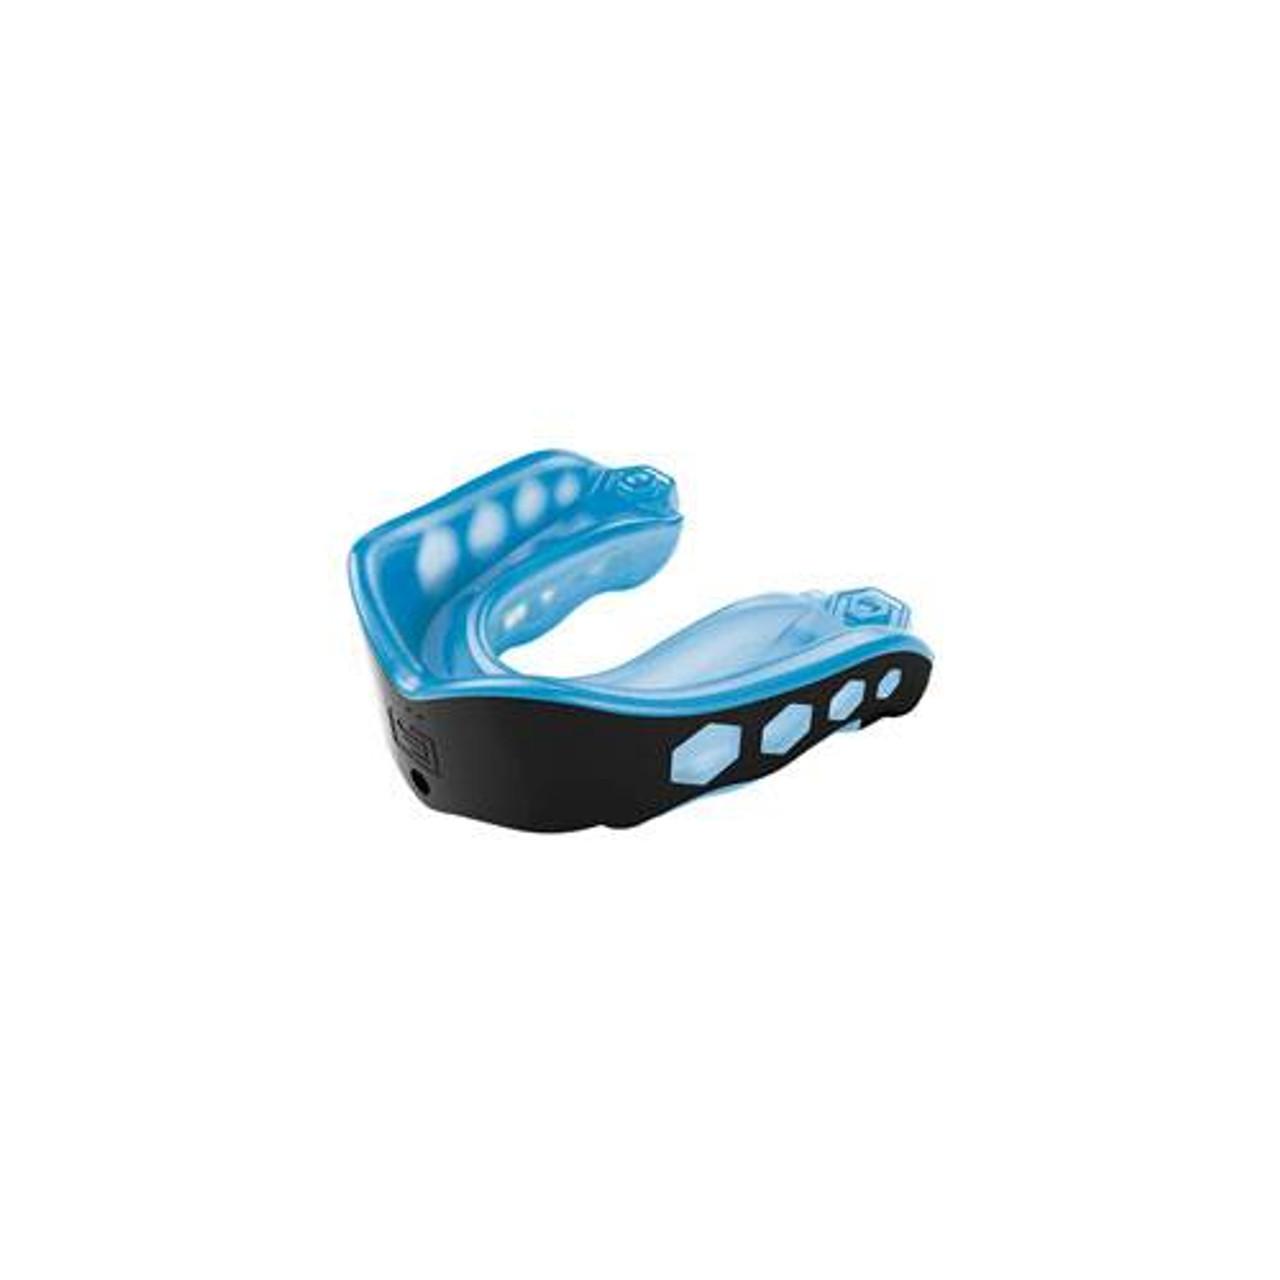 Gel Max Adult Conv Mouthguard-Blue/Bk 48